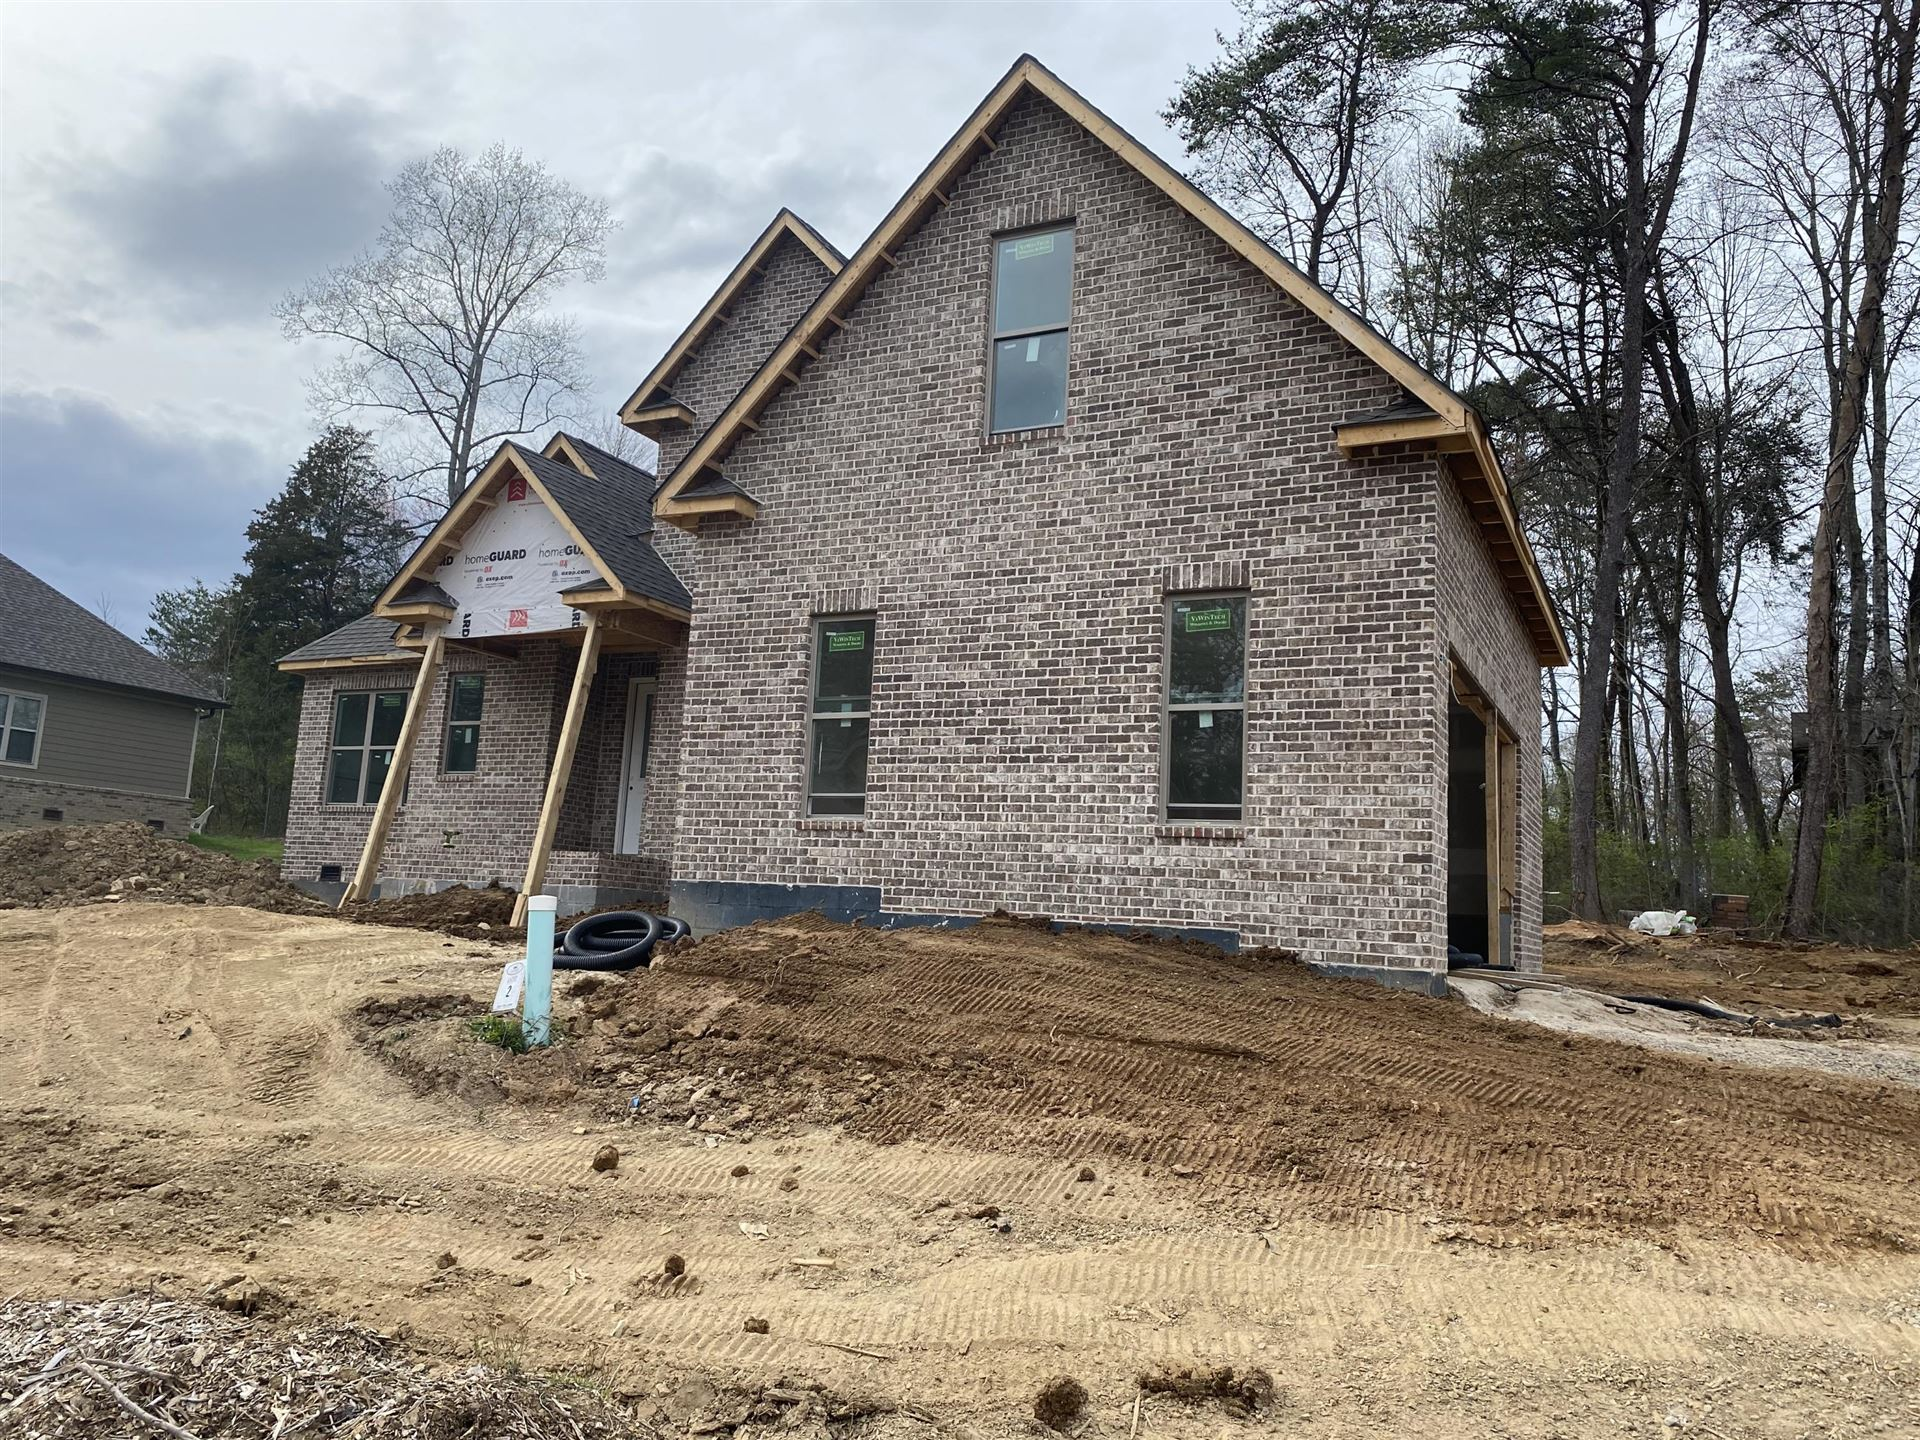 Photo of 105 Crossroads Blvd, Oak Ridge, TN 37830 (MLS # 1146804)